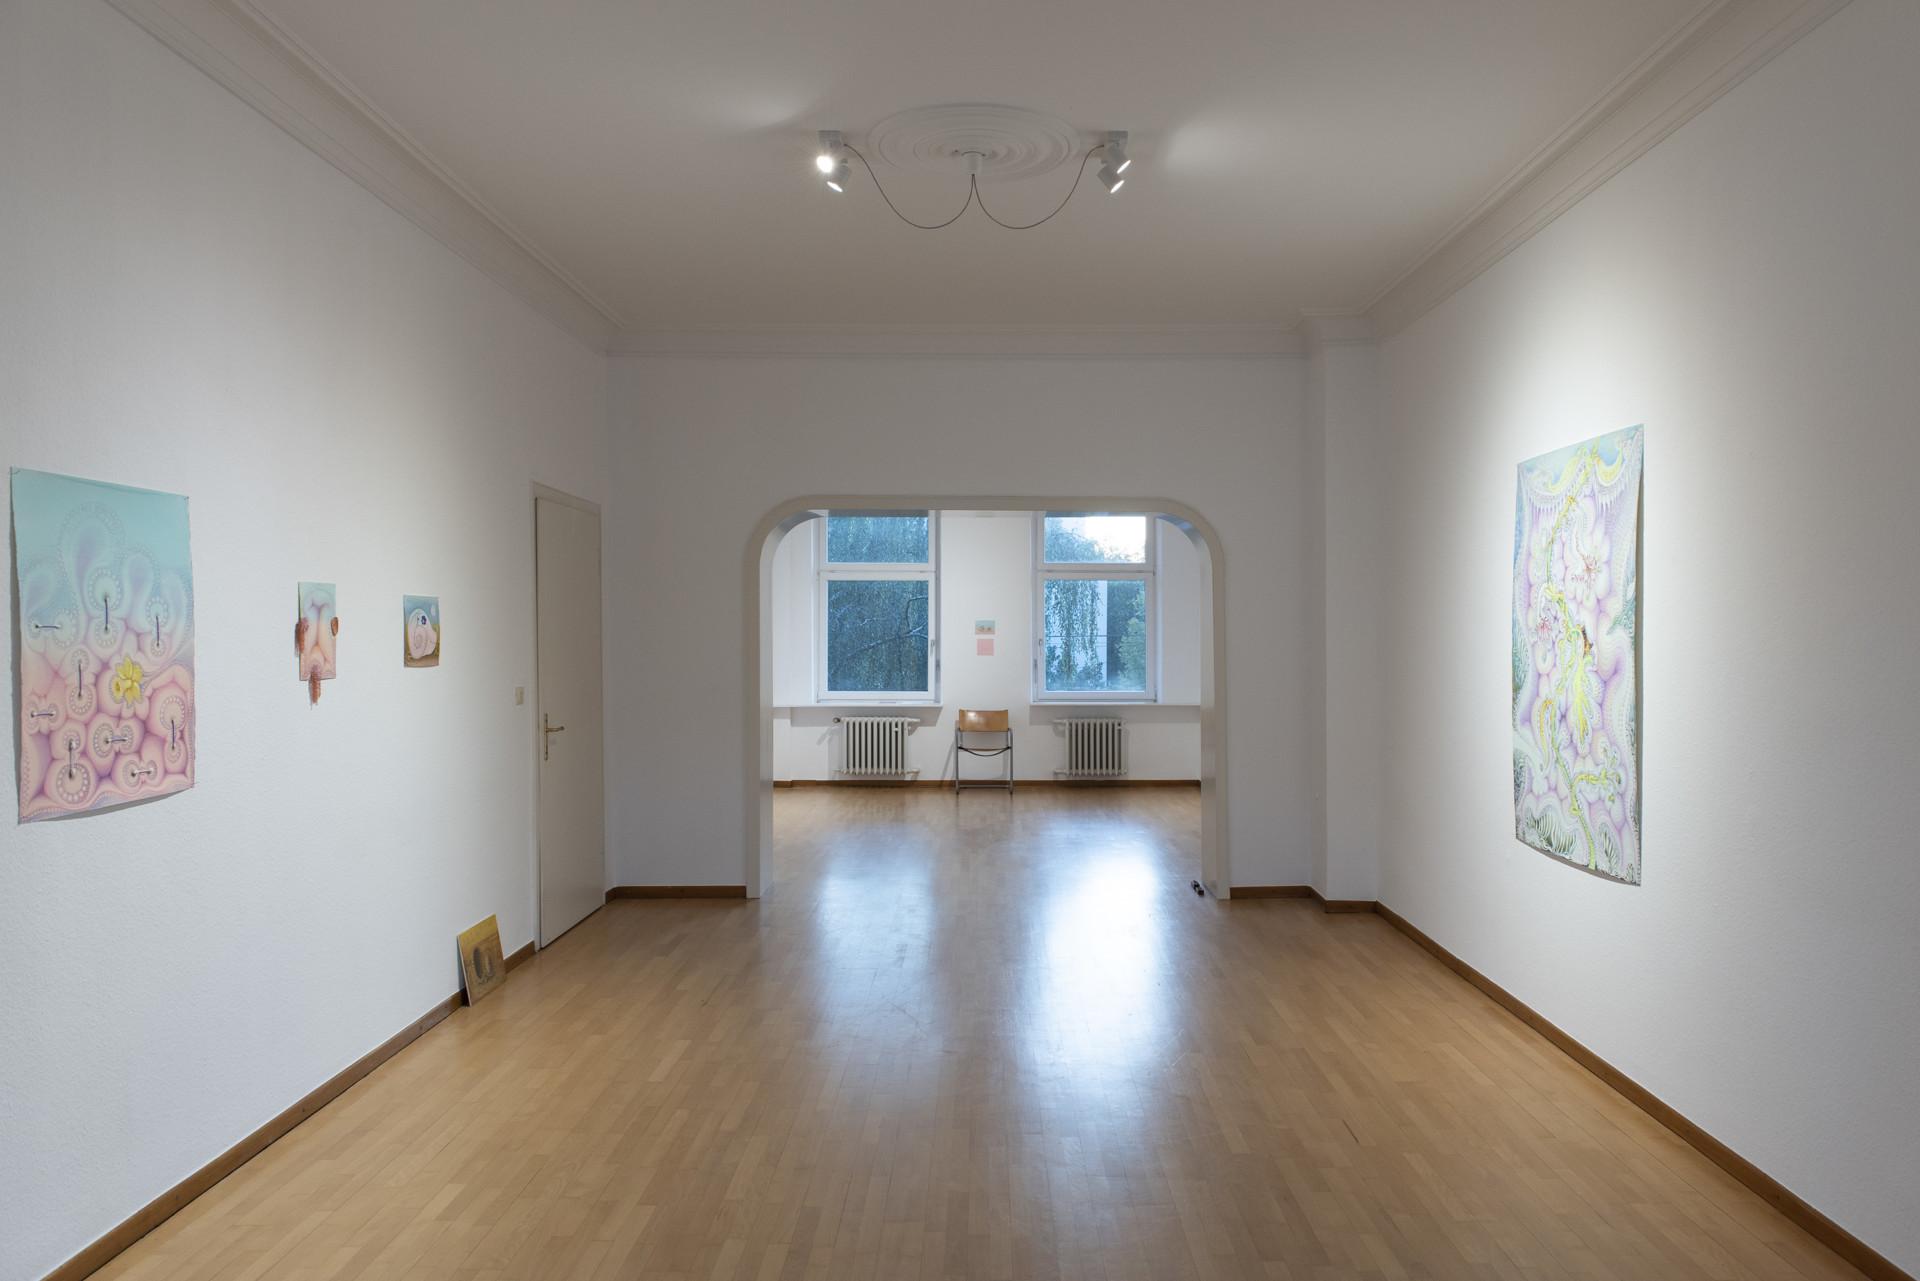 lucashirsch.com Exhibitions